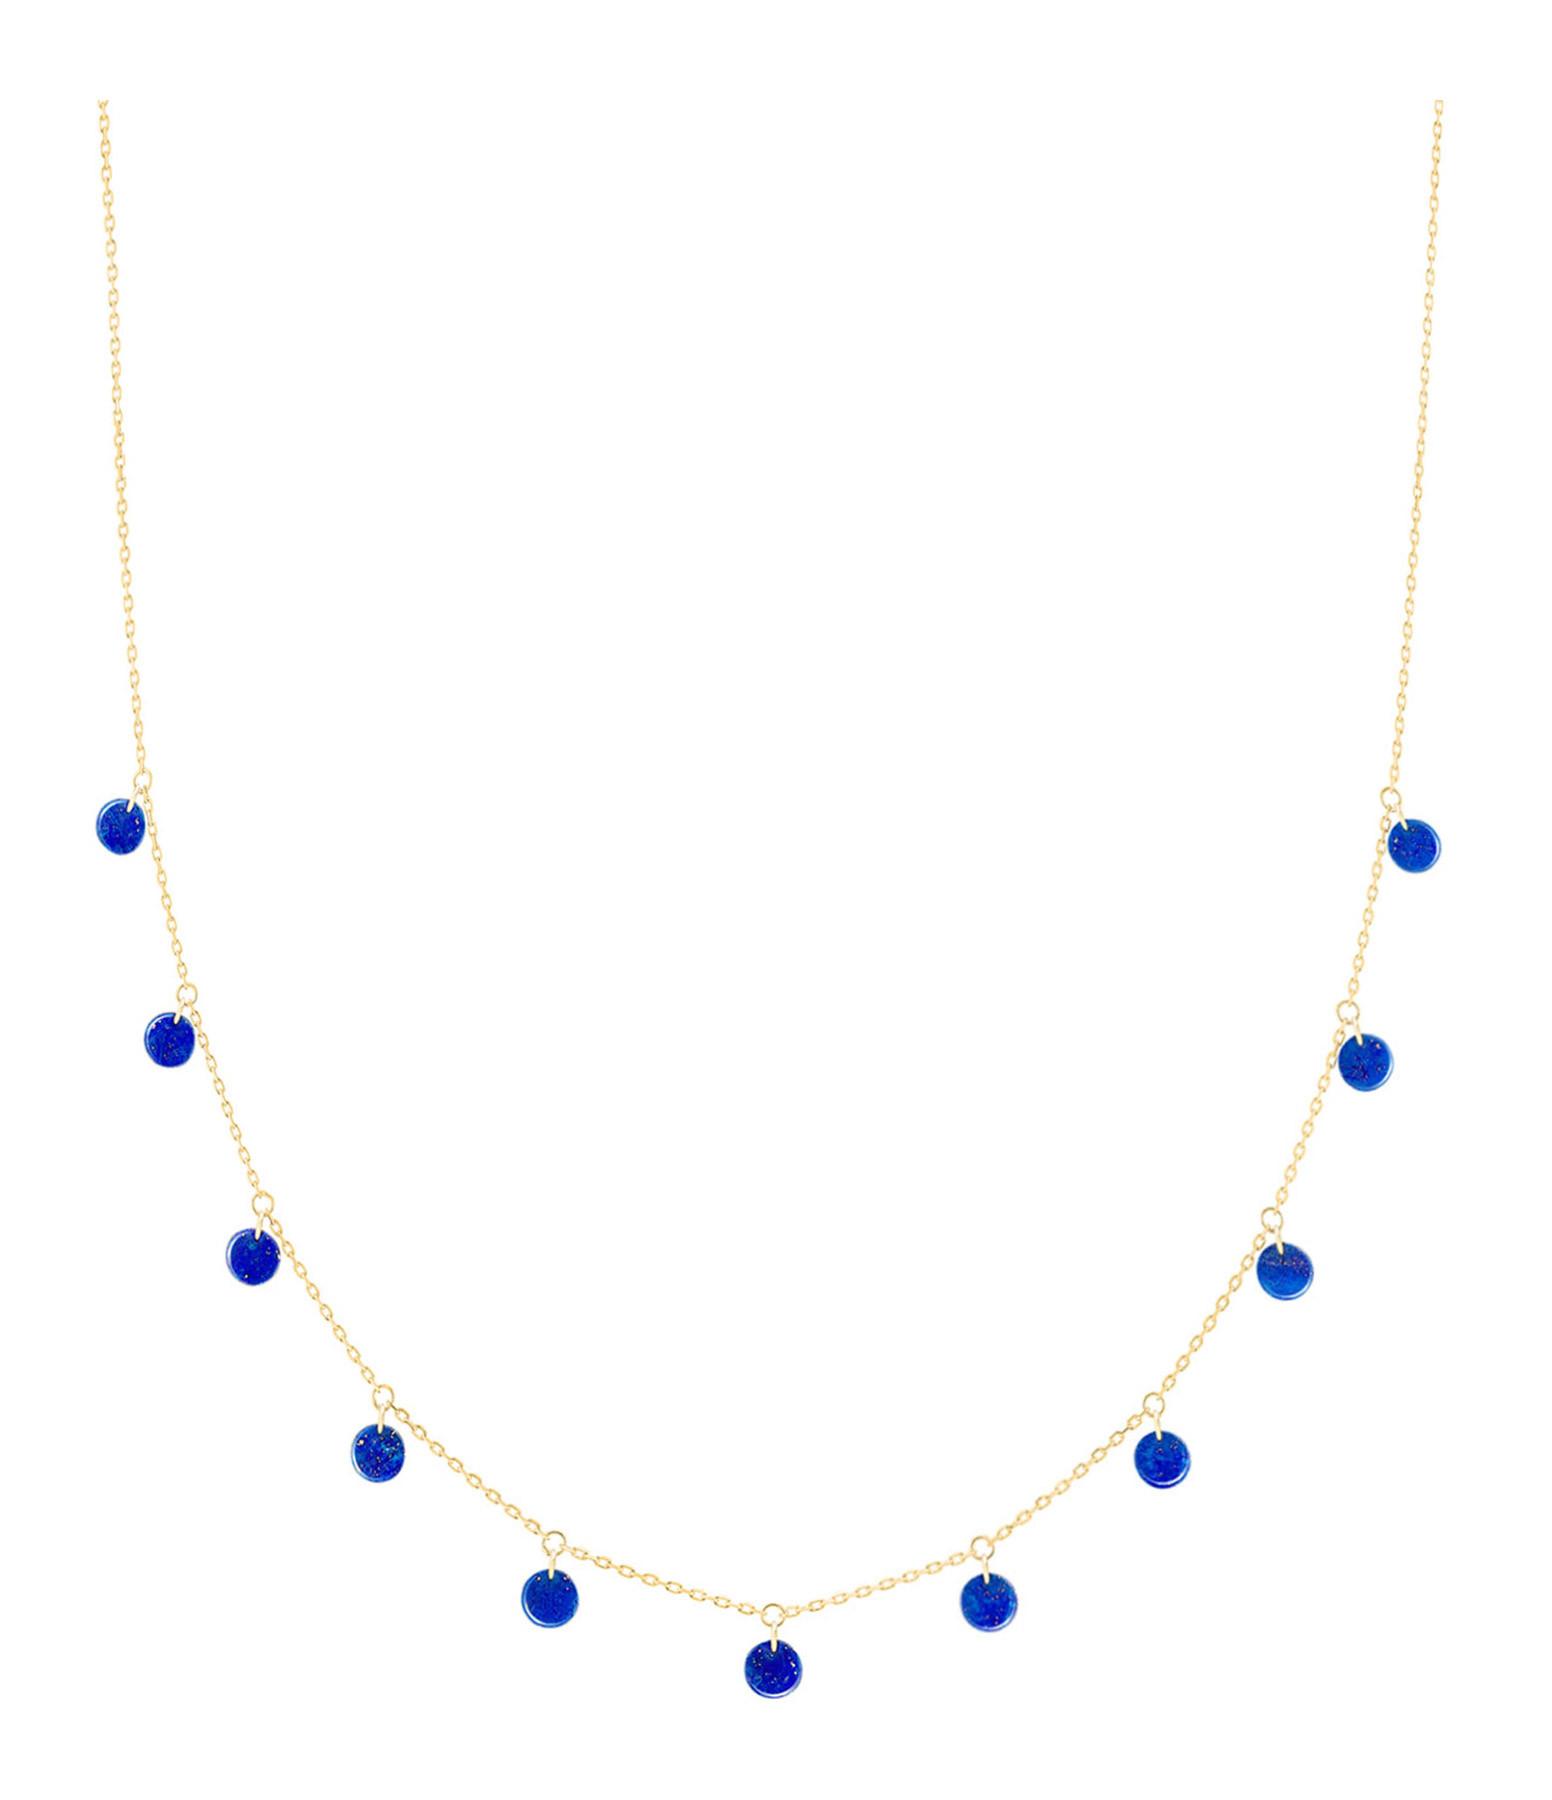 LA BRUNE & LA BLONDE - Collier Polka Or Jaune Pierres Lapis Lazuli